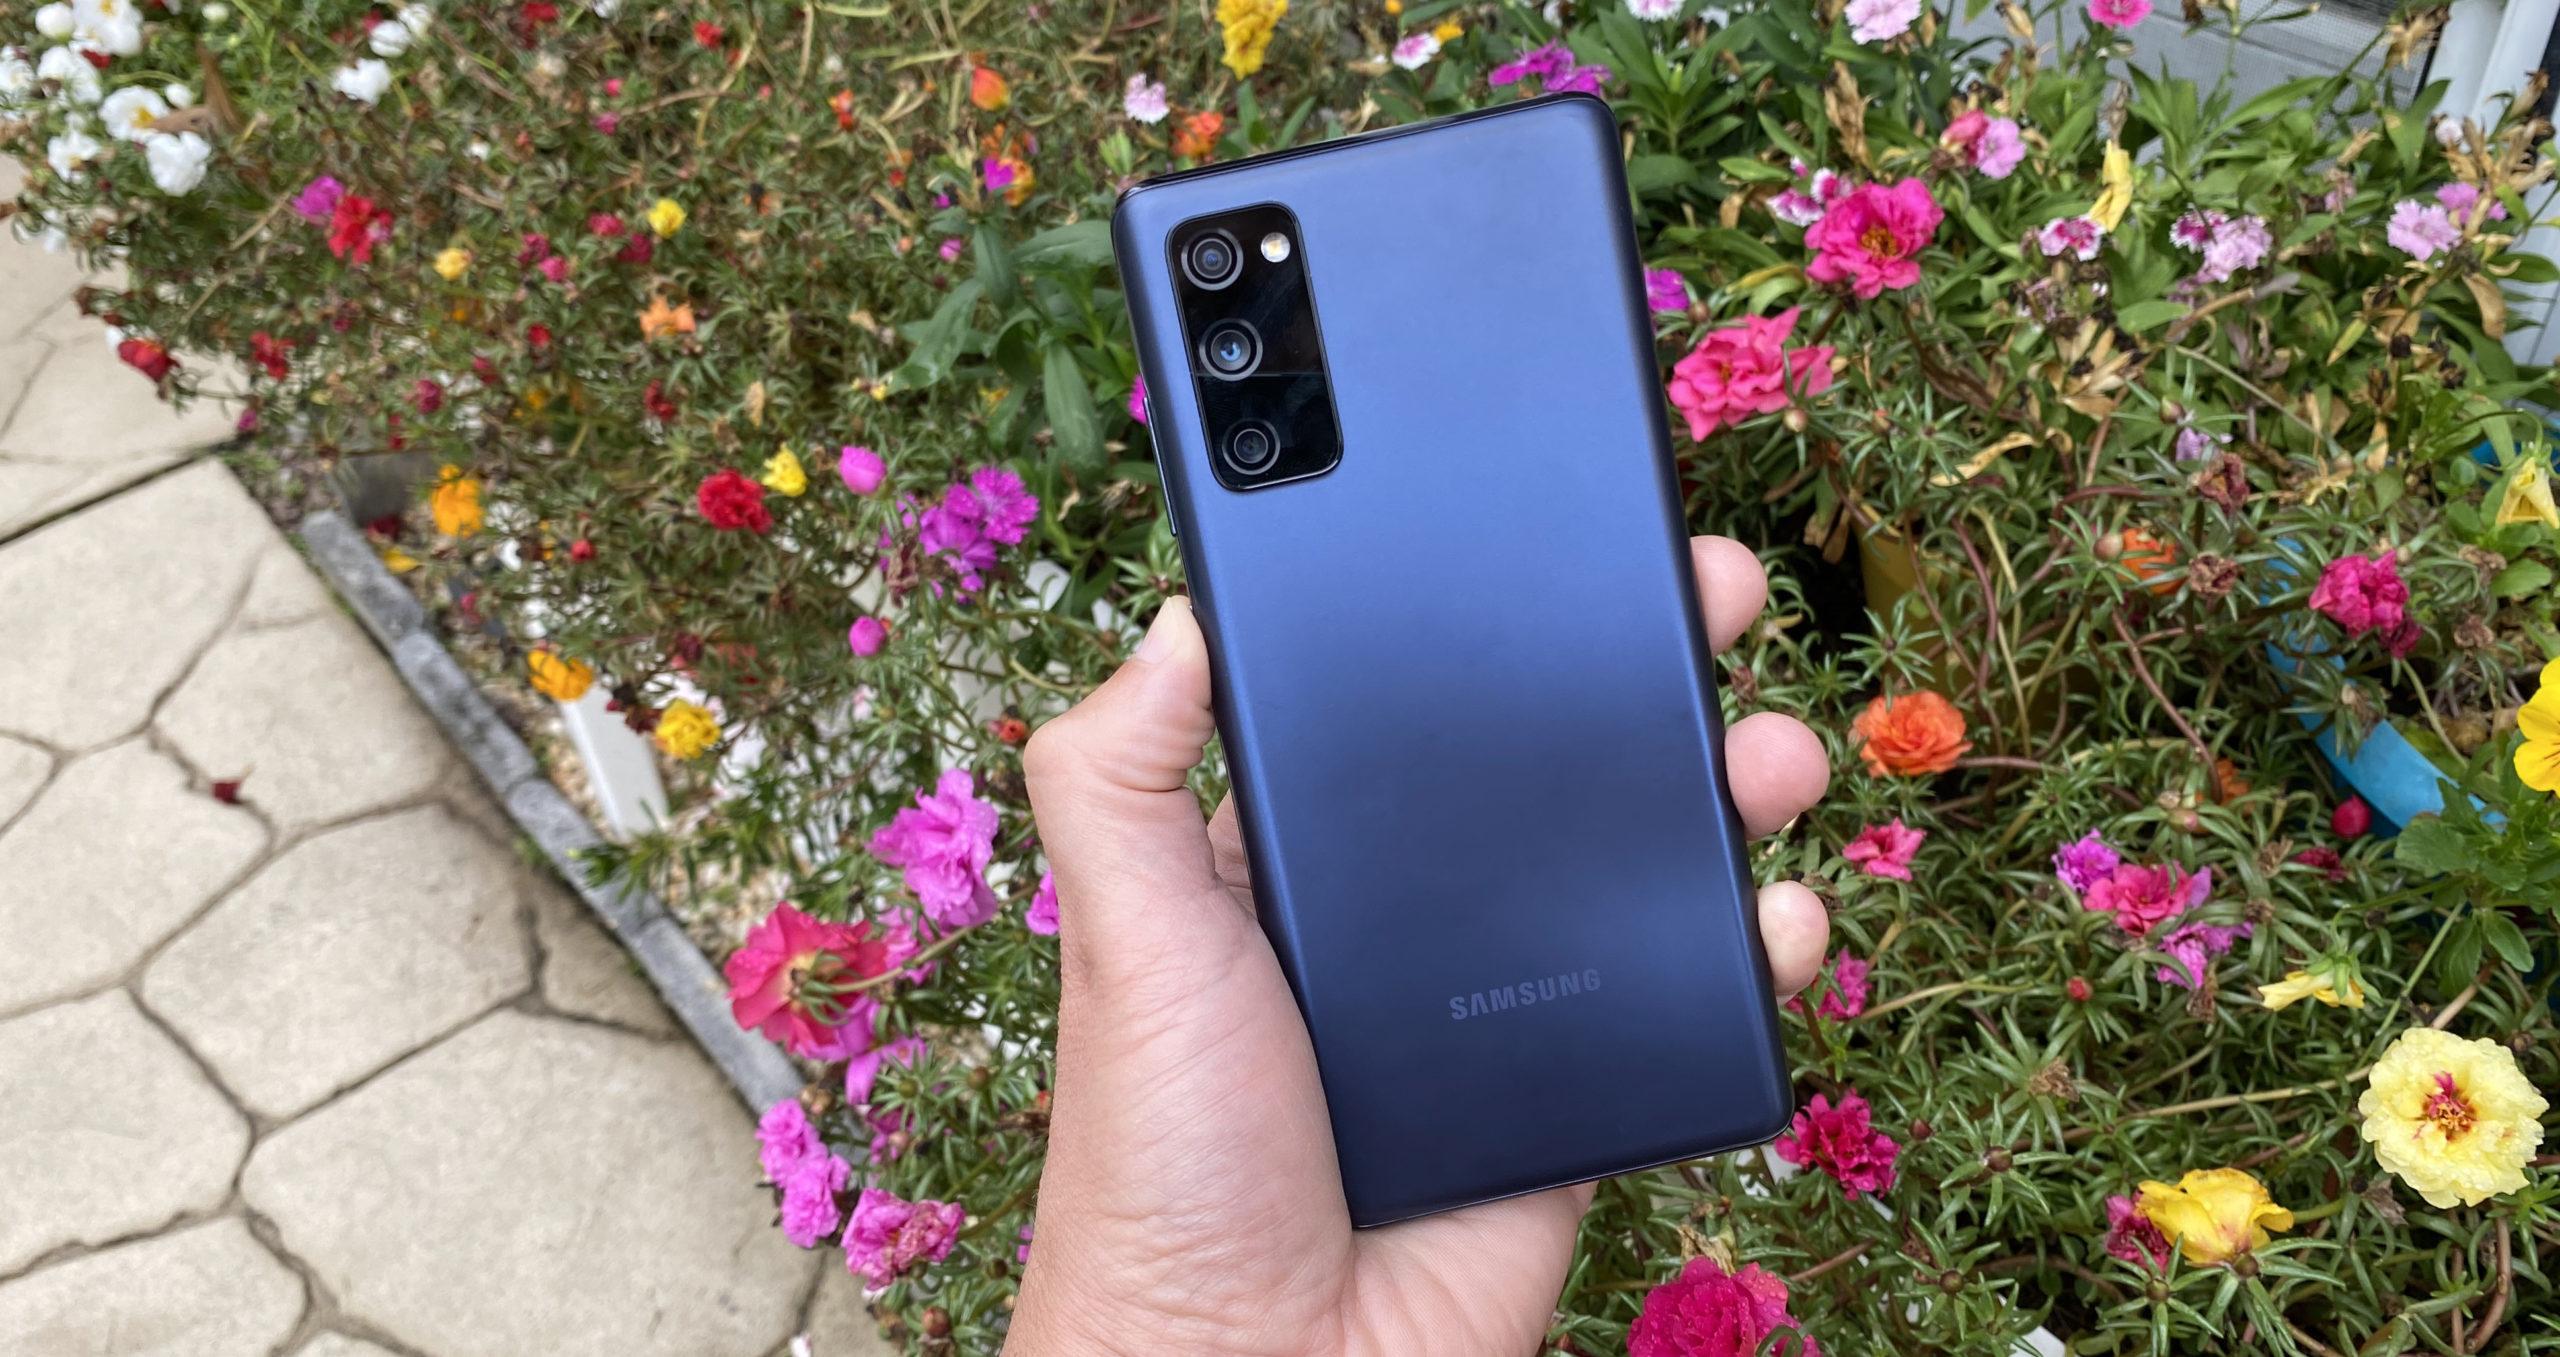 Samsung new upcoming phones